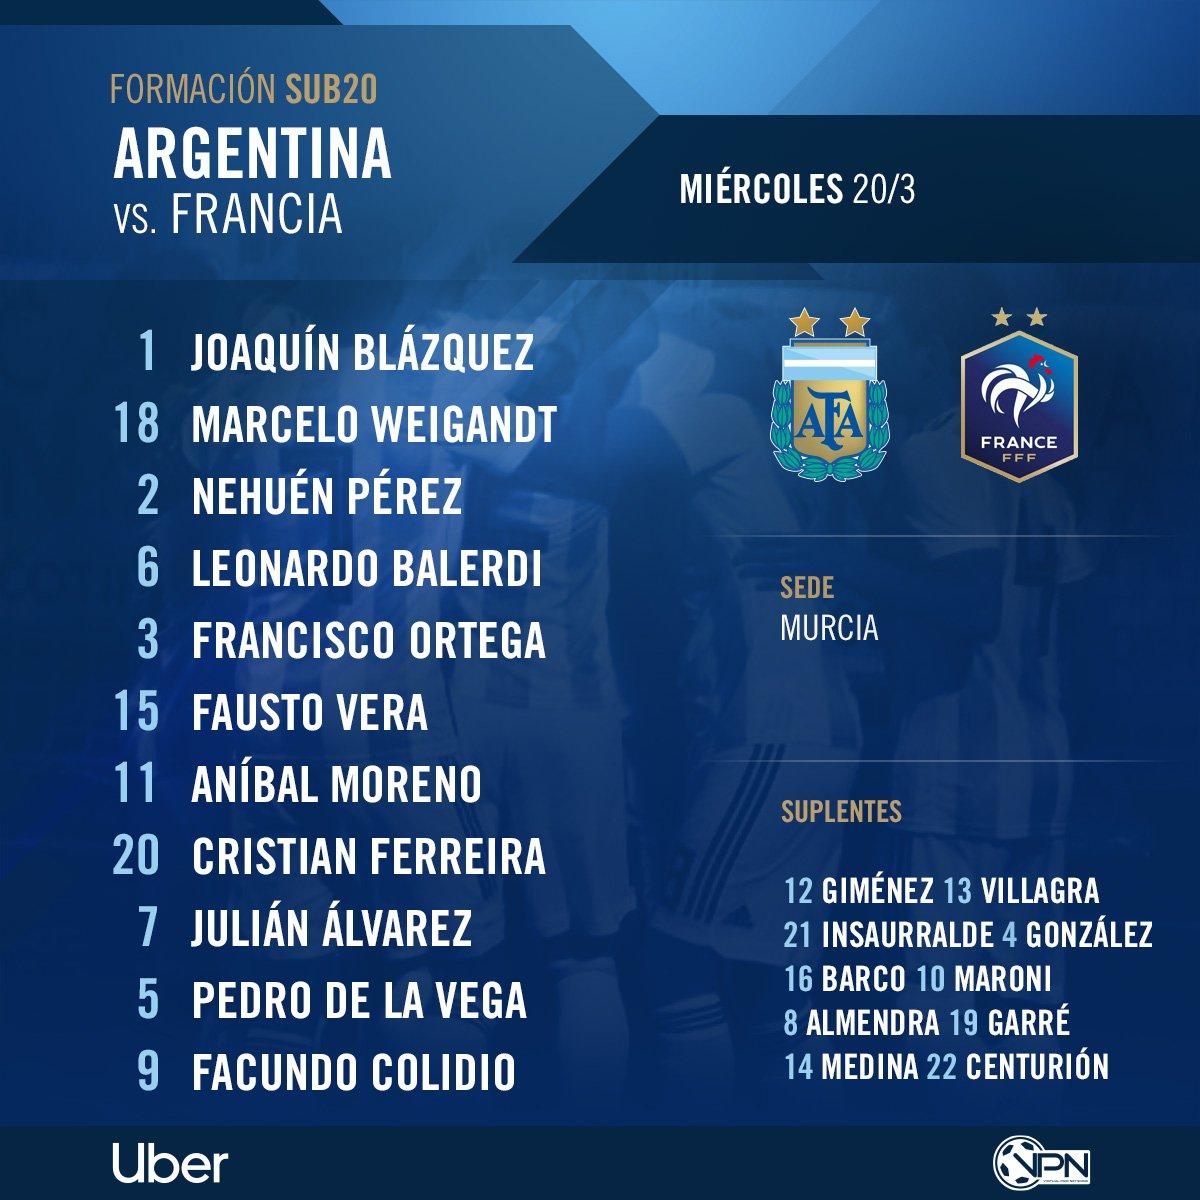 Selecci贸n Argentina 馃嚘馃嚪's photo on #sub20